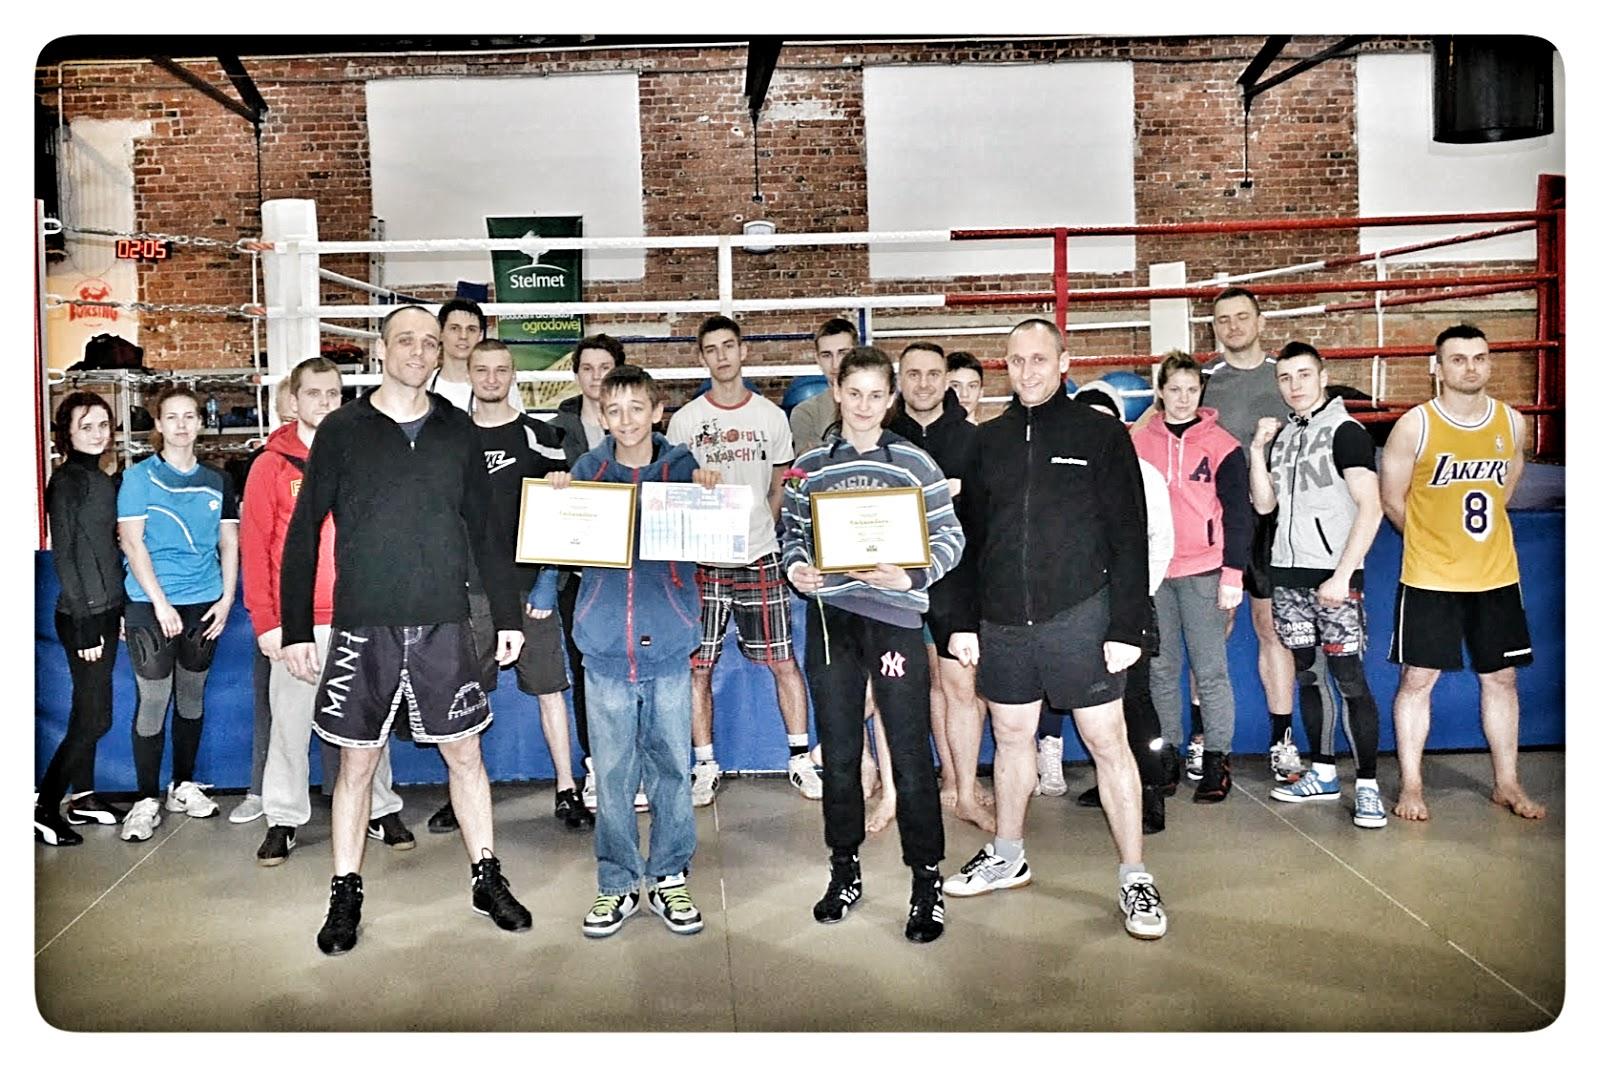 Ambasador, kickboxing, boks, muay thai, trening, smartphon, motorola, moto g, sport, Zielona Góra